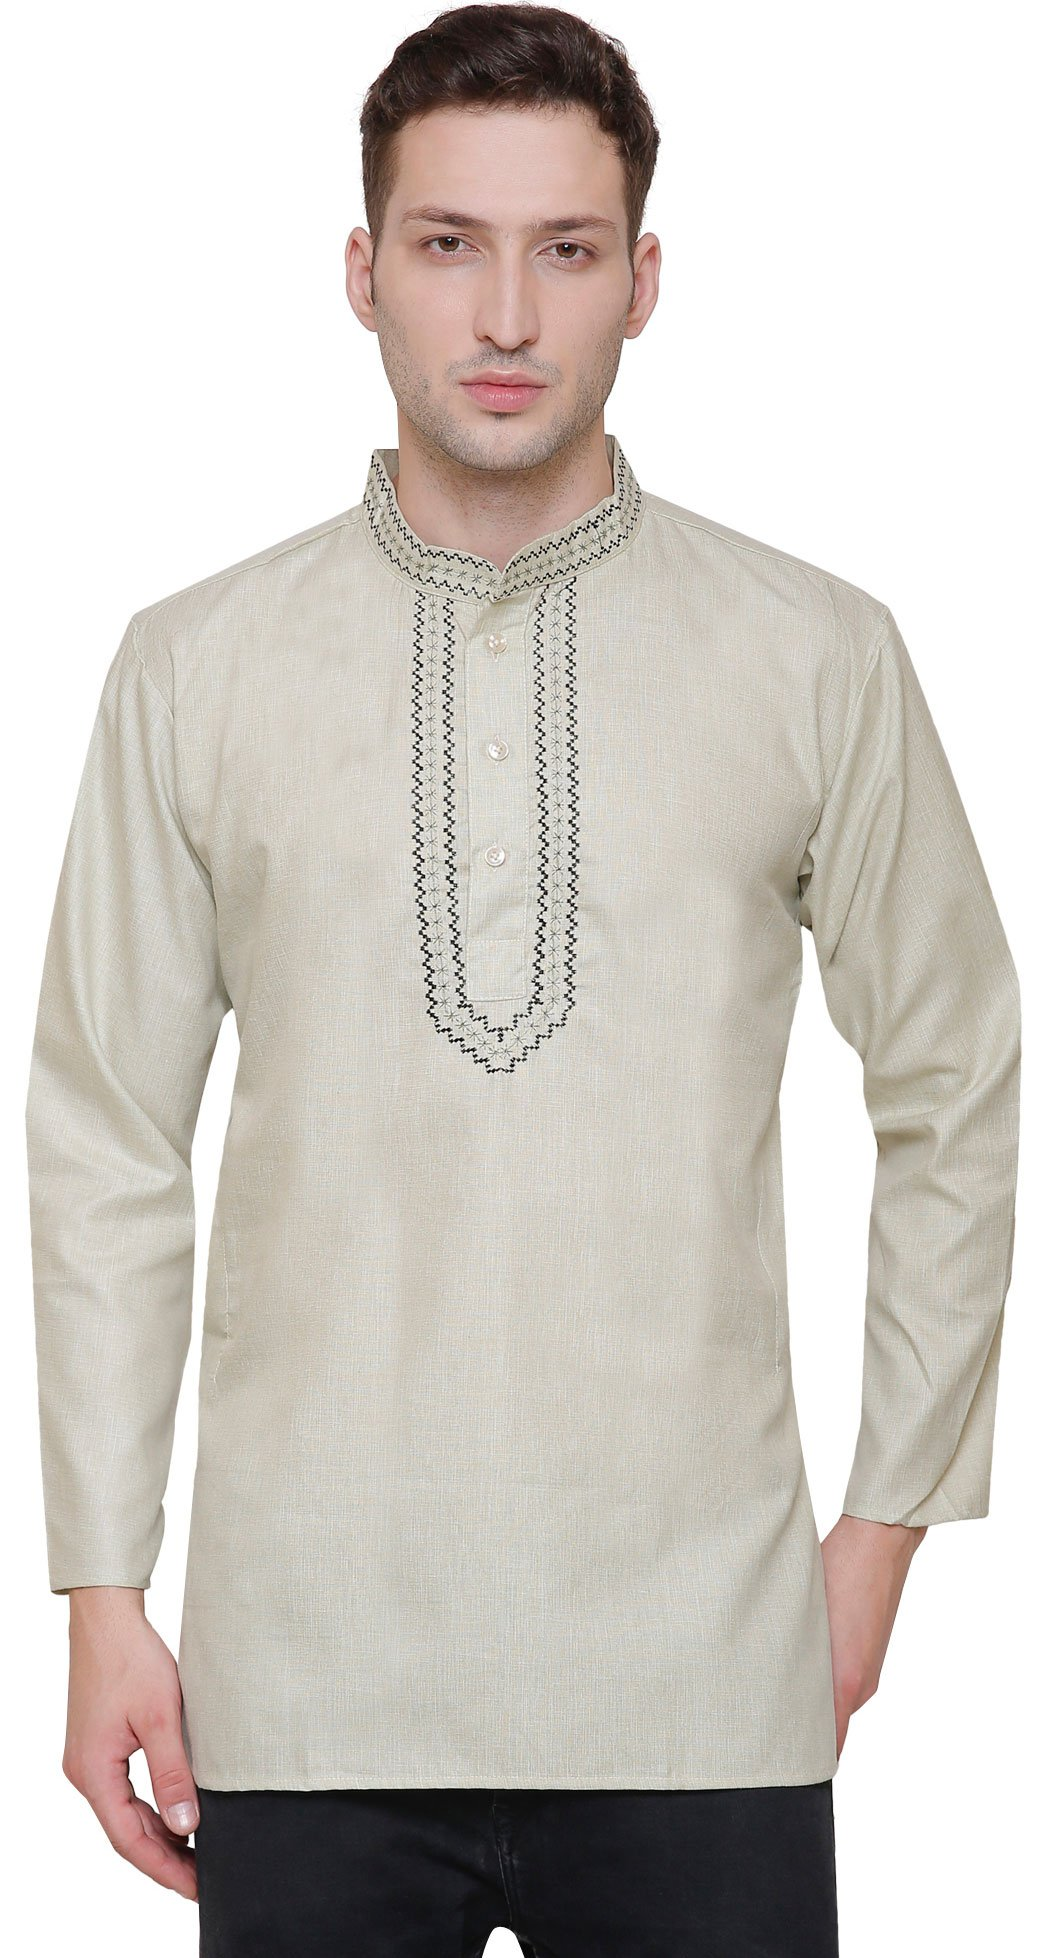 Cotton Men's Short Kurta Fashion Indian Clothing (Light Green, L)